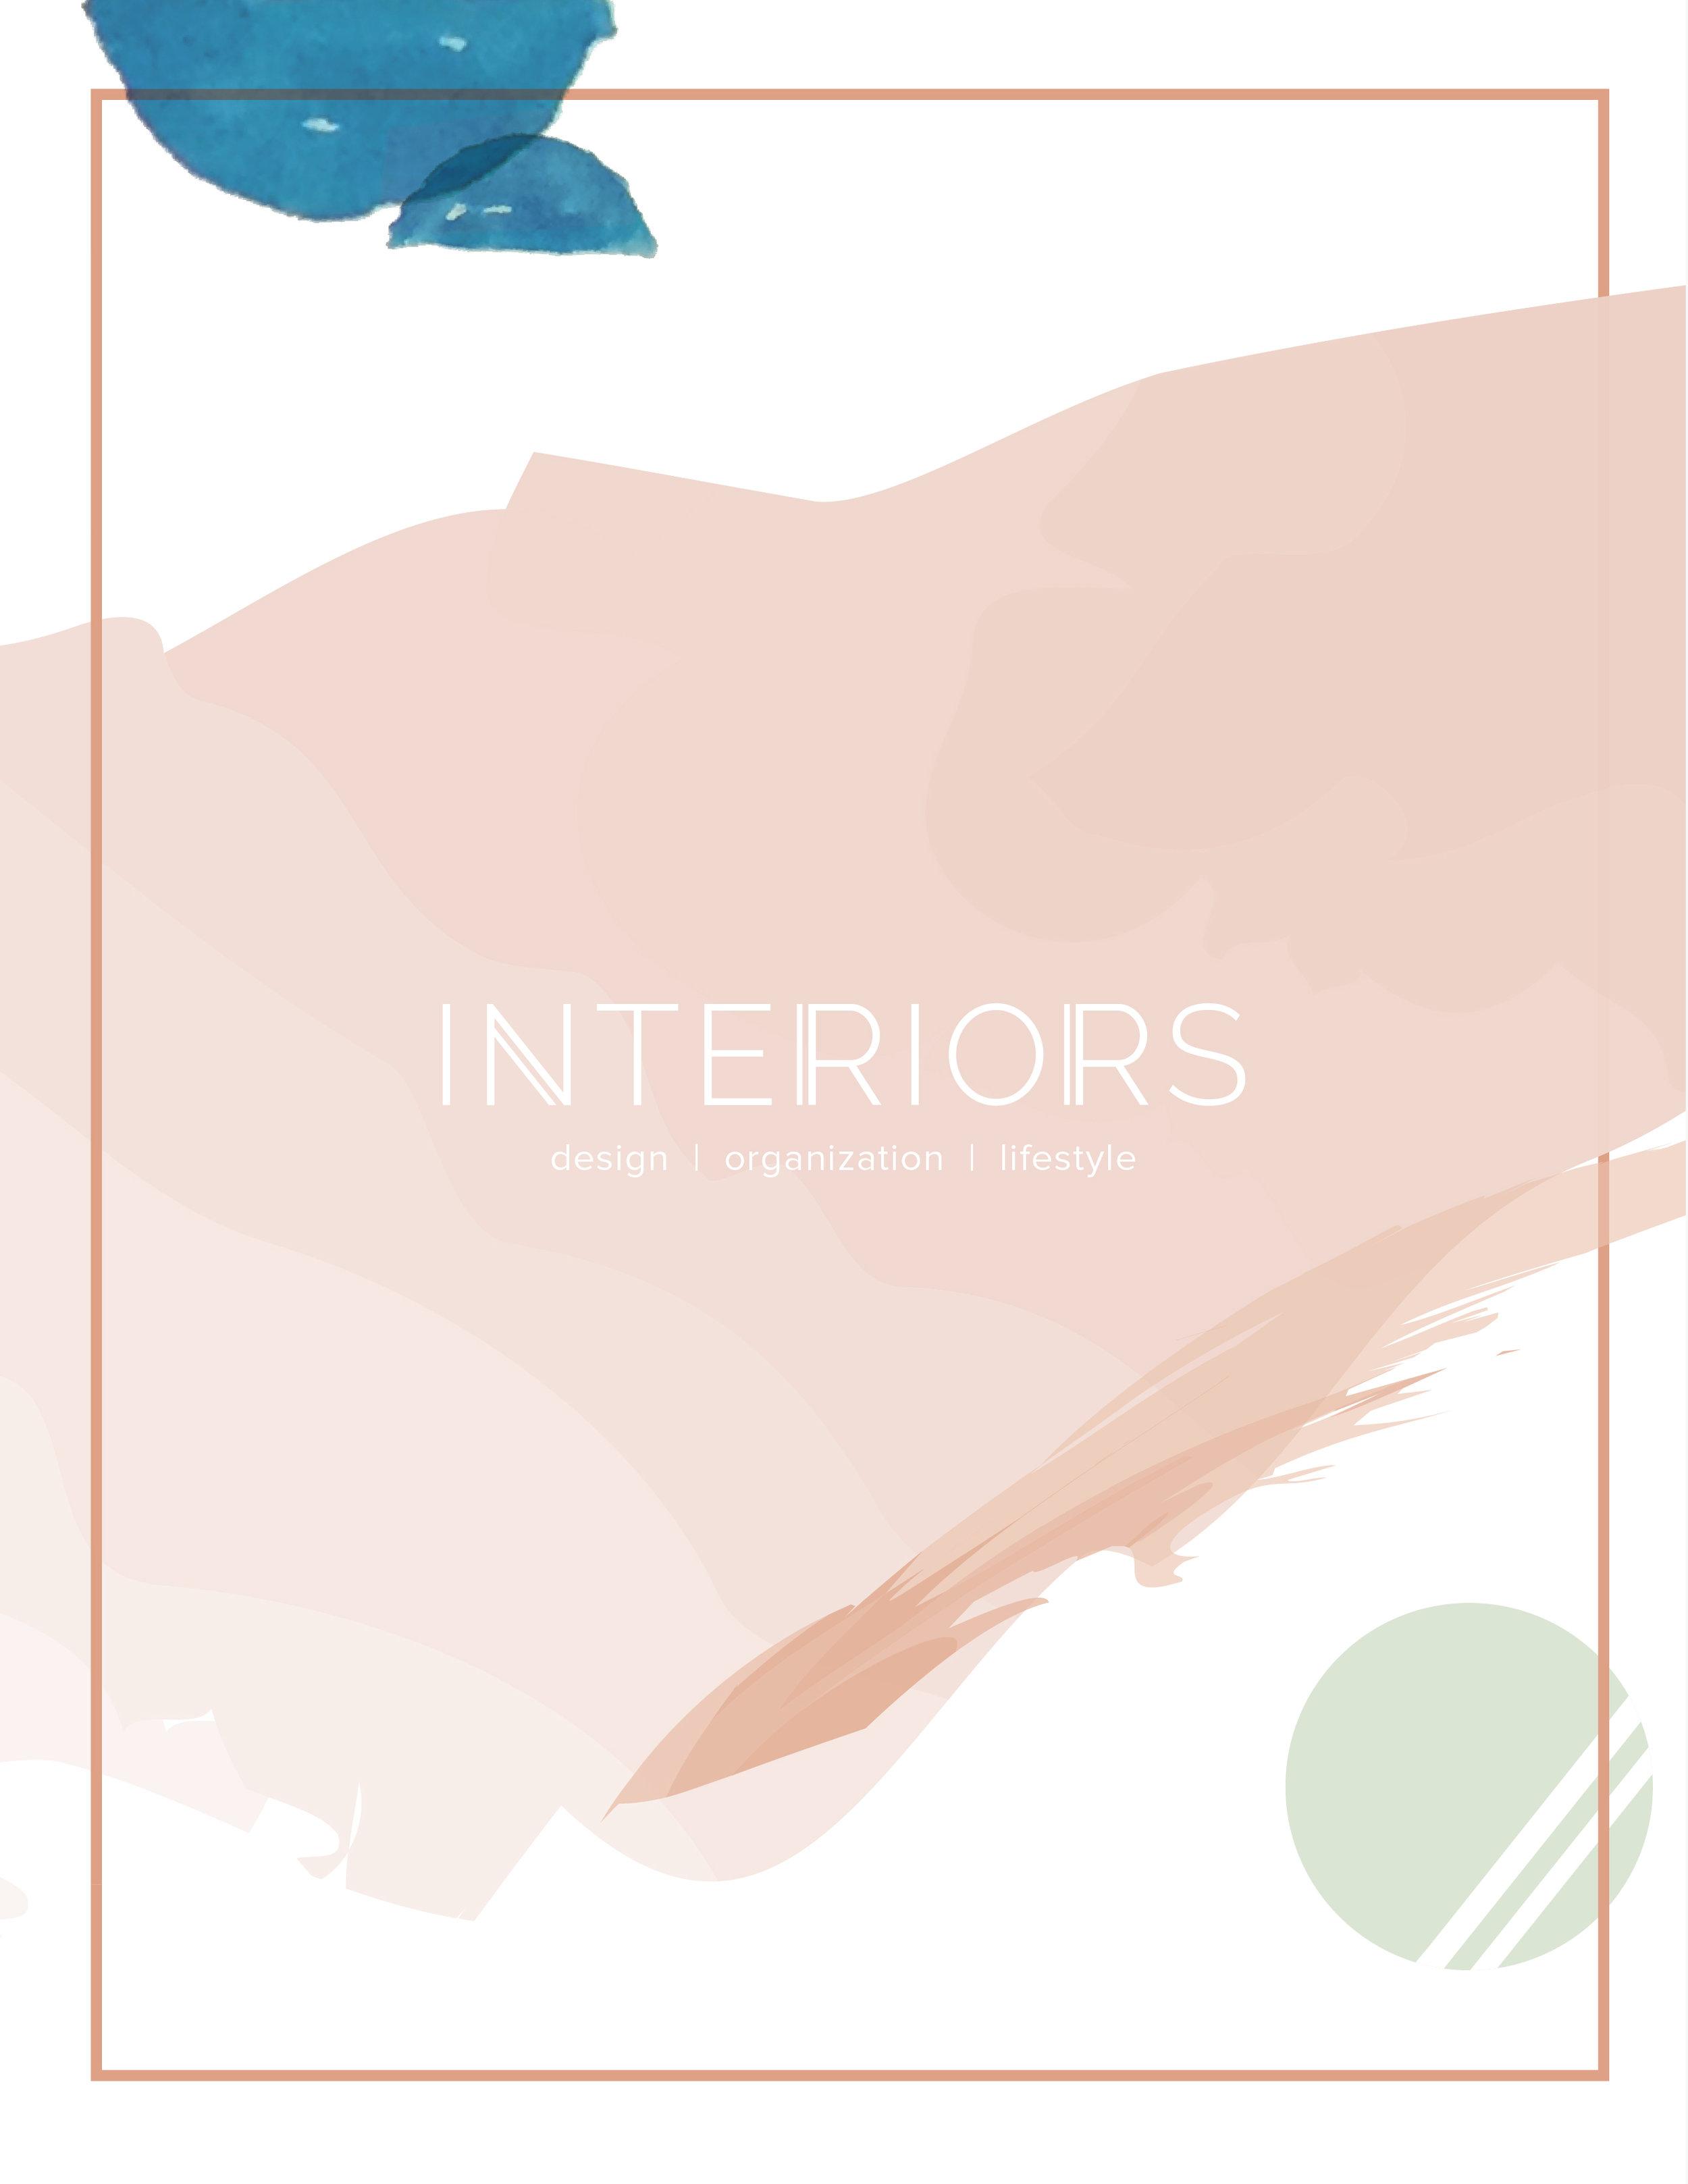 Interiors_BrandStyleGuide-01.jpg